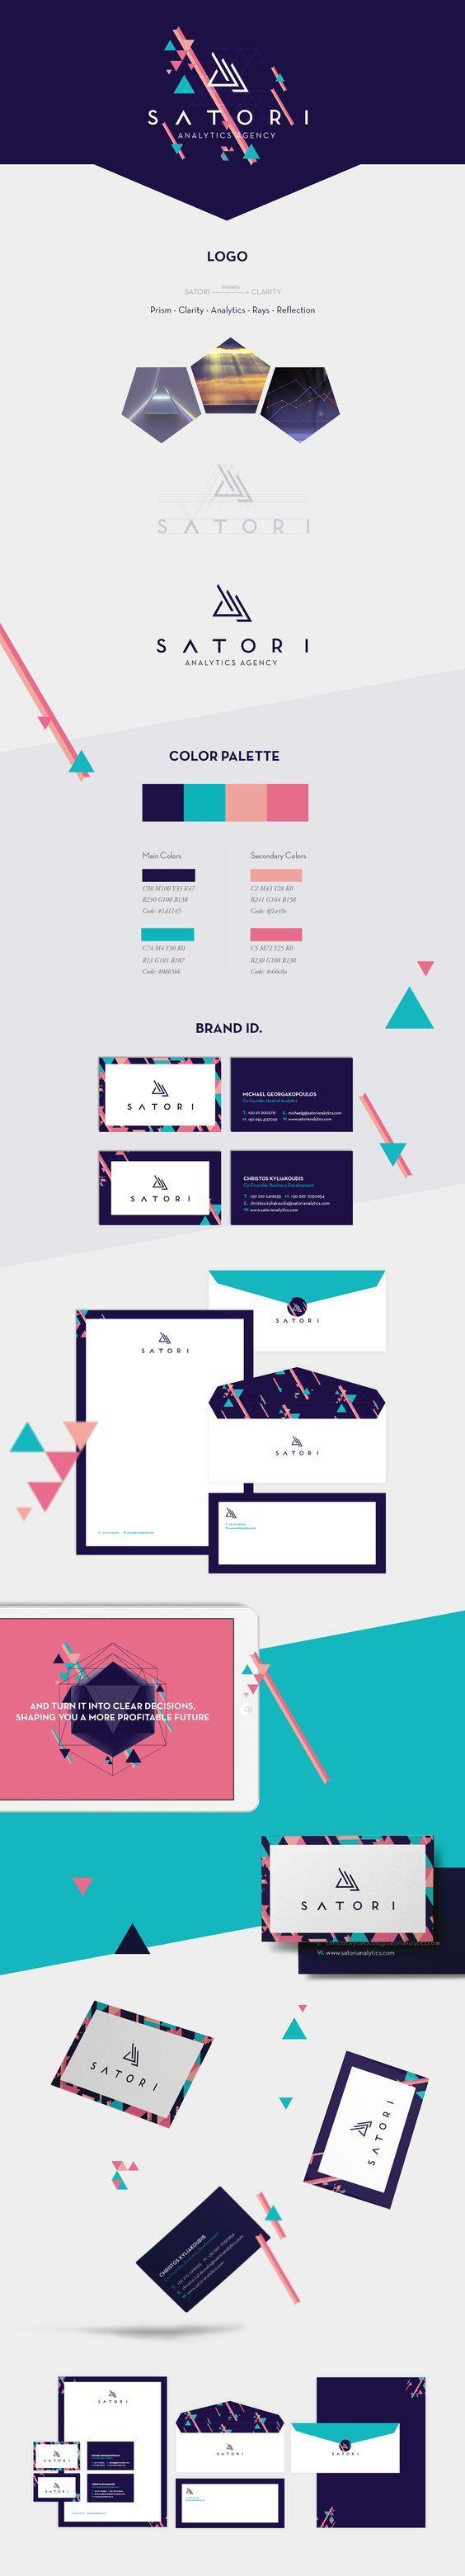 Satori Branding on Behance | Fivestar Branding – Design and Branding Agency & Inspiration Gallery